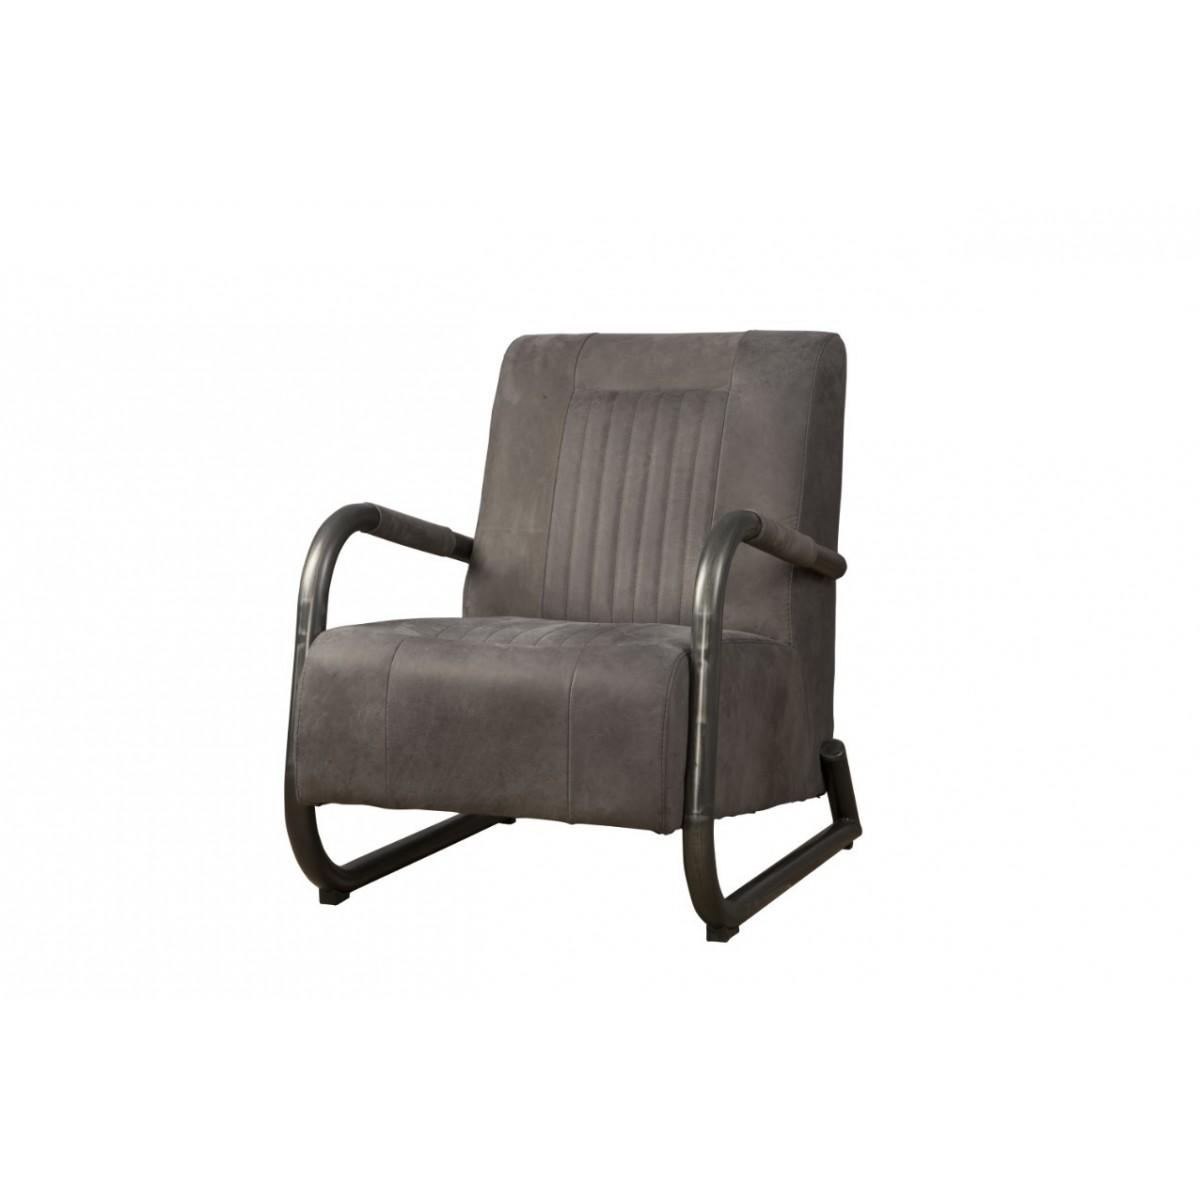 barn-coffeechair-fauteuil-vintage-leer-stone-lm0017